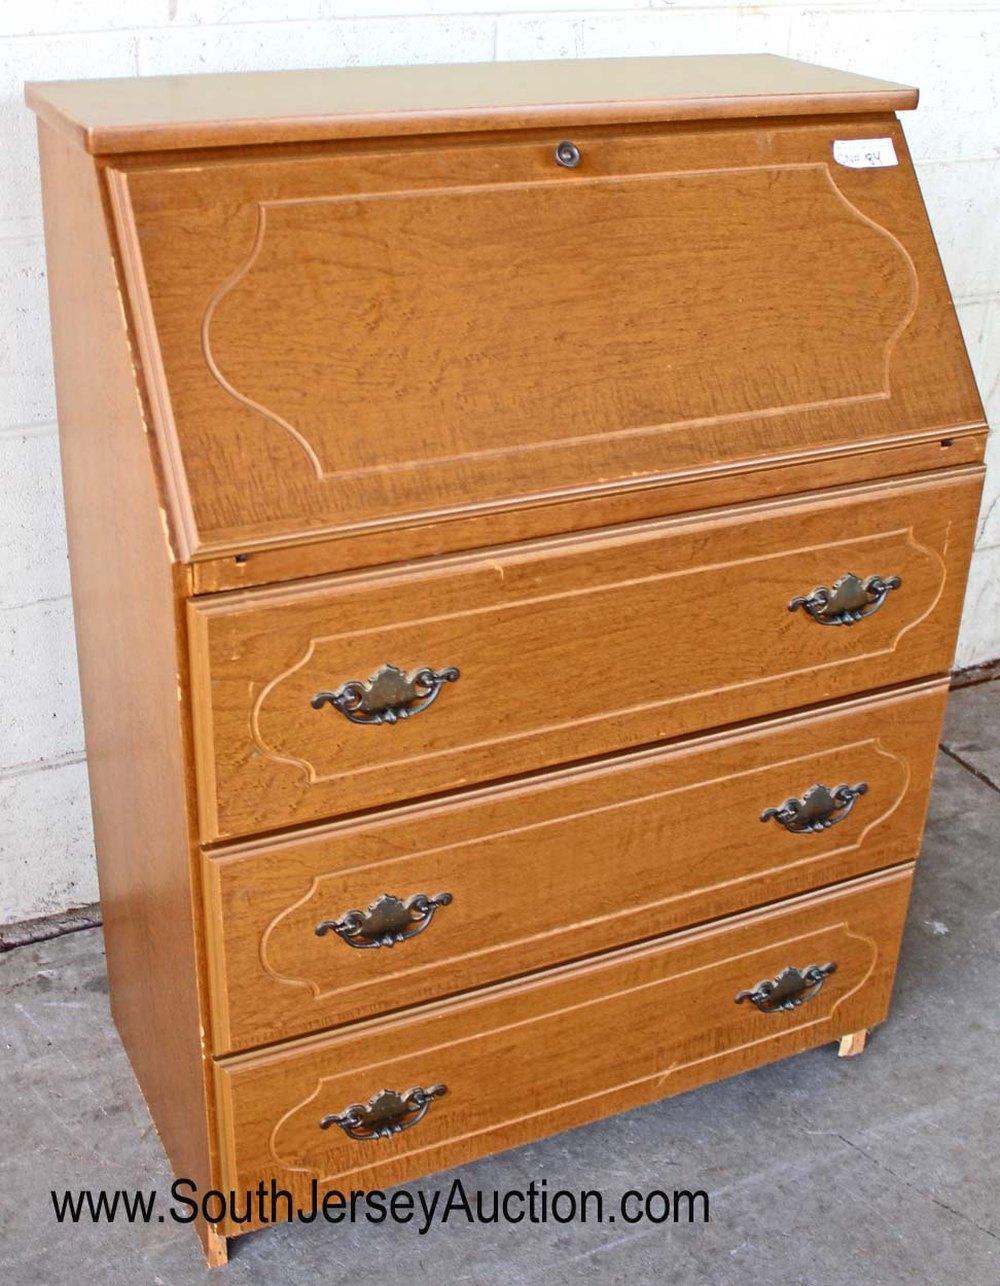 Contemporary Maple Slant Front Desk